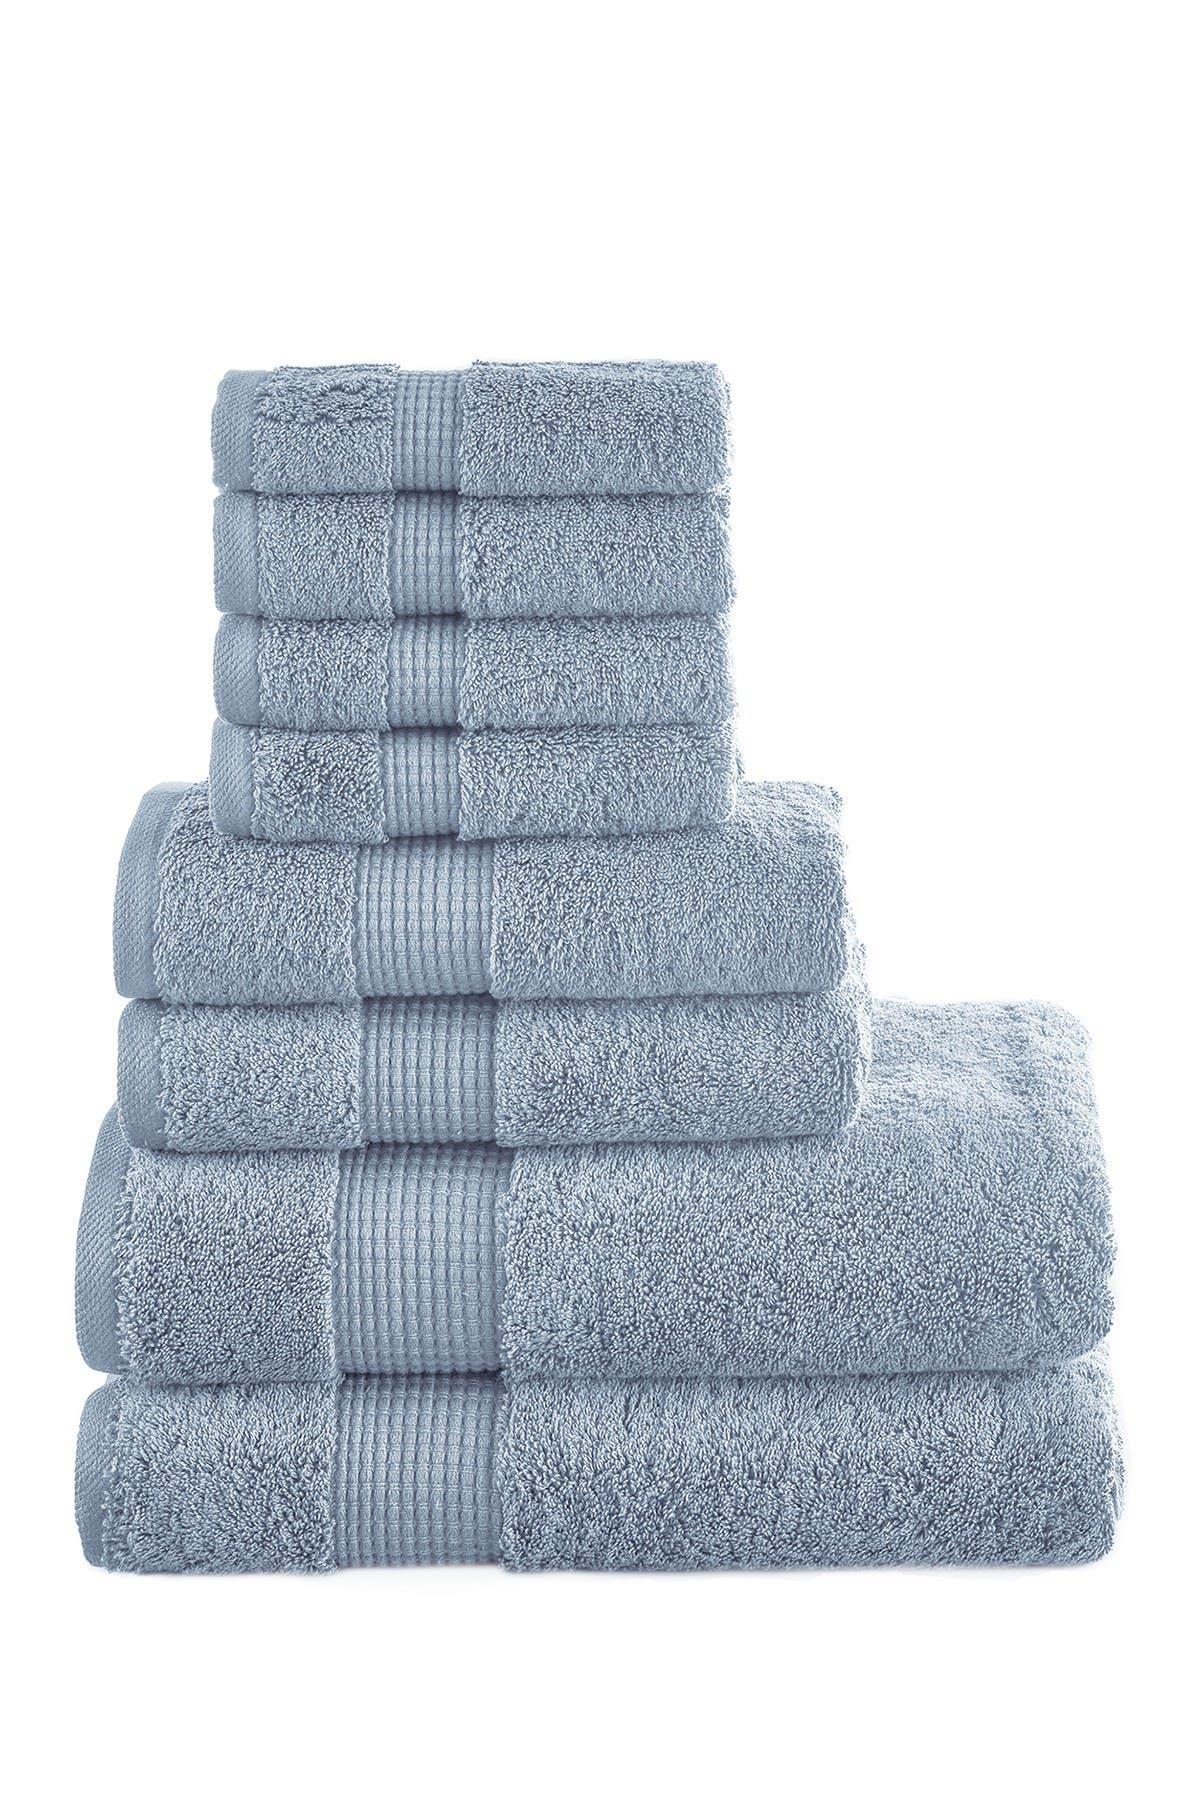 Image of Modern Threads Manor Ridge Turkish Cotton 700 GSM 8-Piece Towel Set - Blue